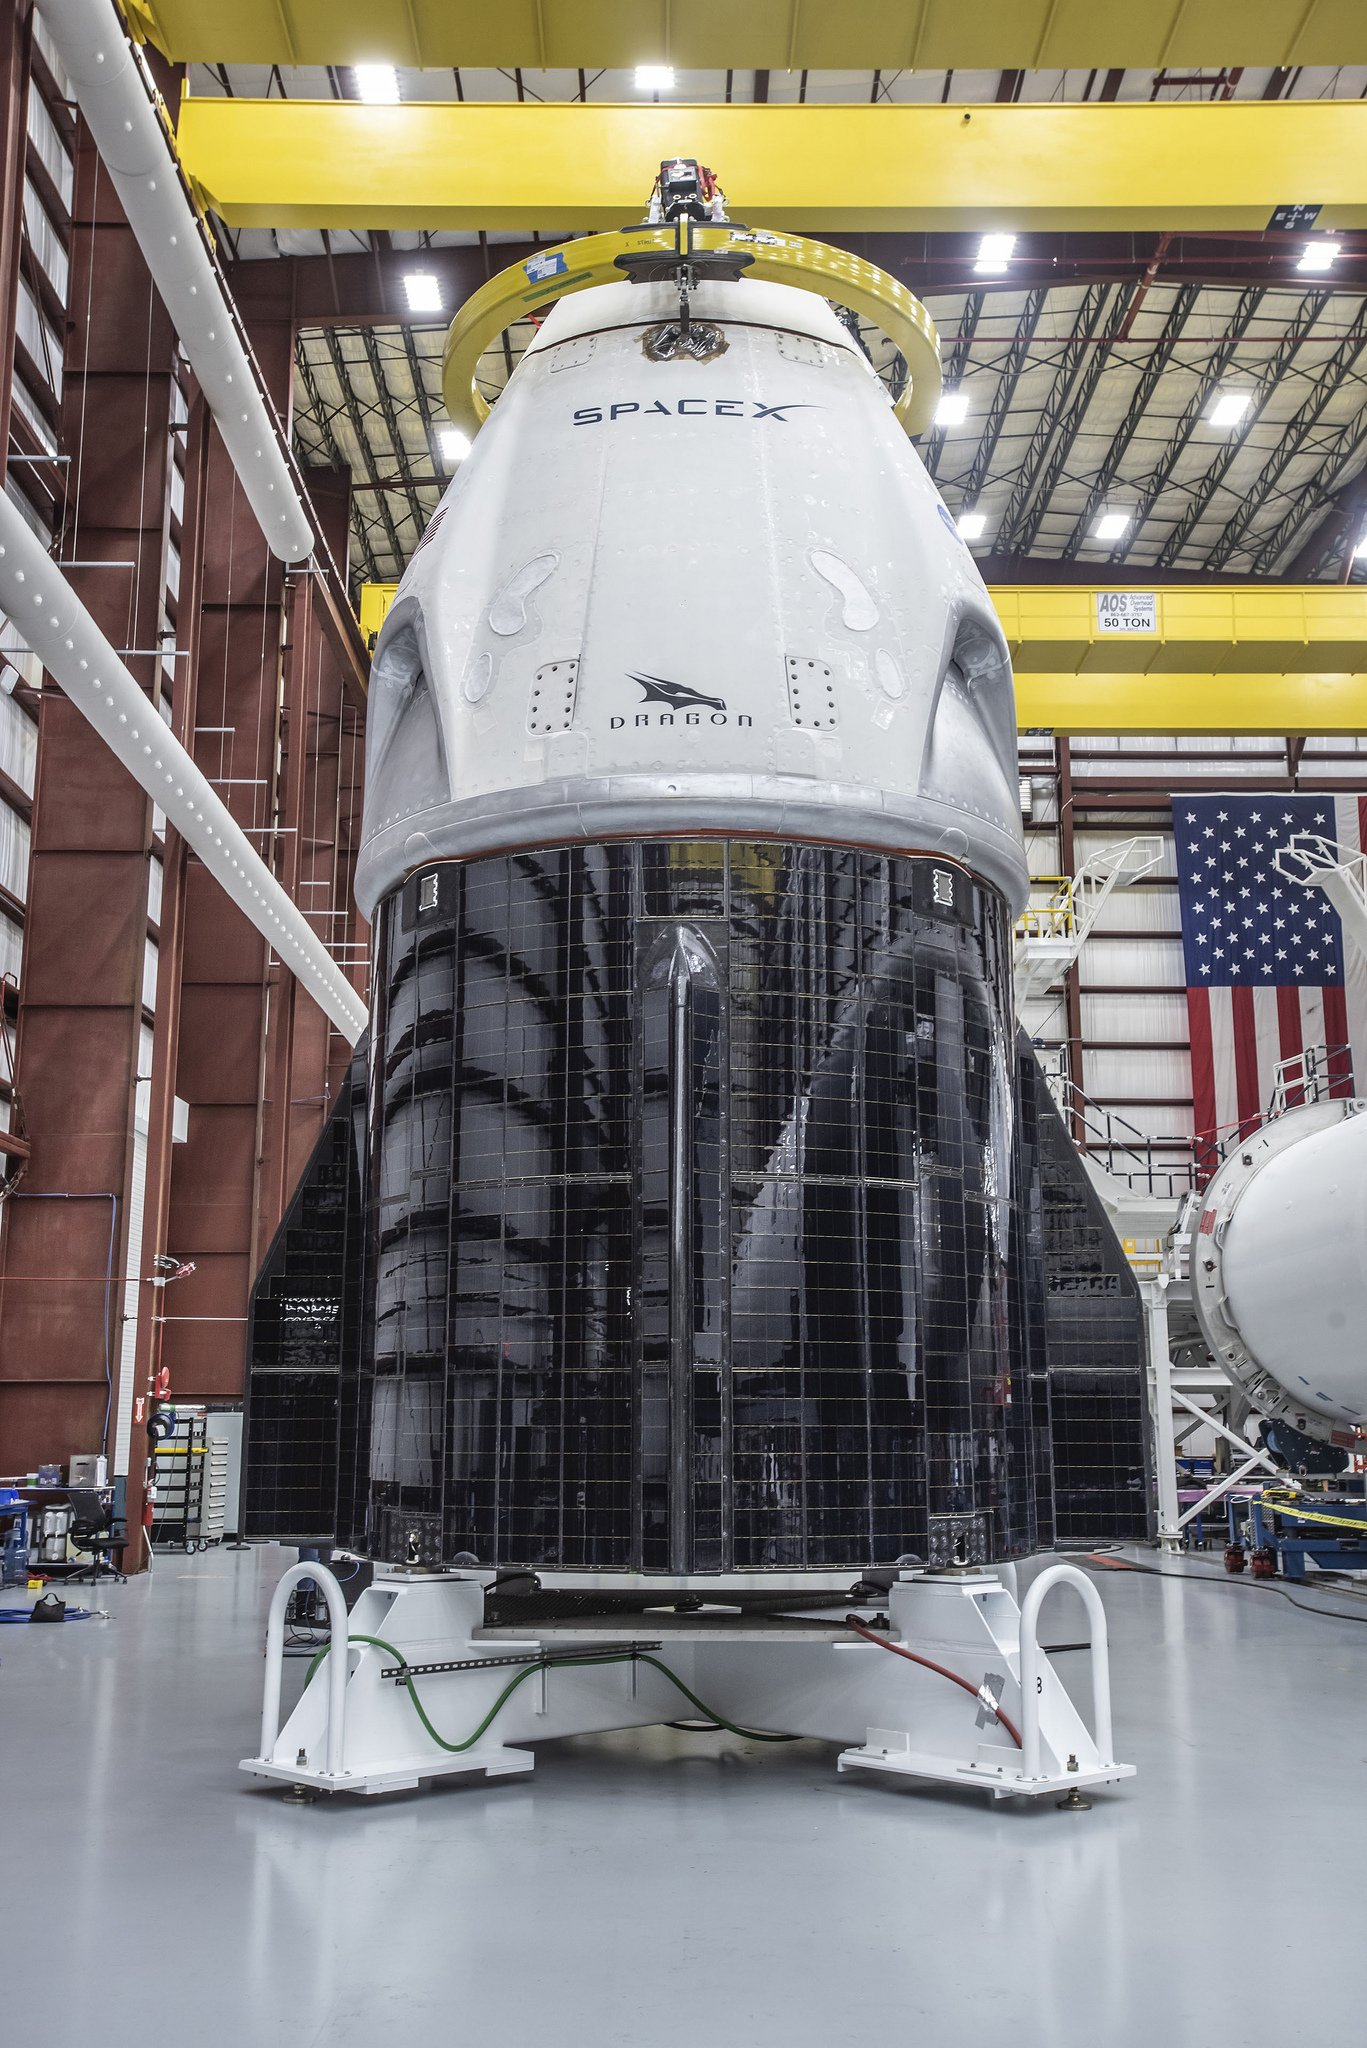 Falcon 9 (Dragon 2 Demo-1) - KSC - 02.03.2019 - Page 6 Duuug_FXgAAPYsr